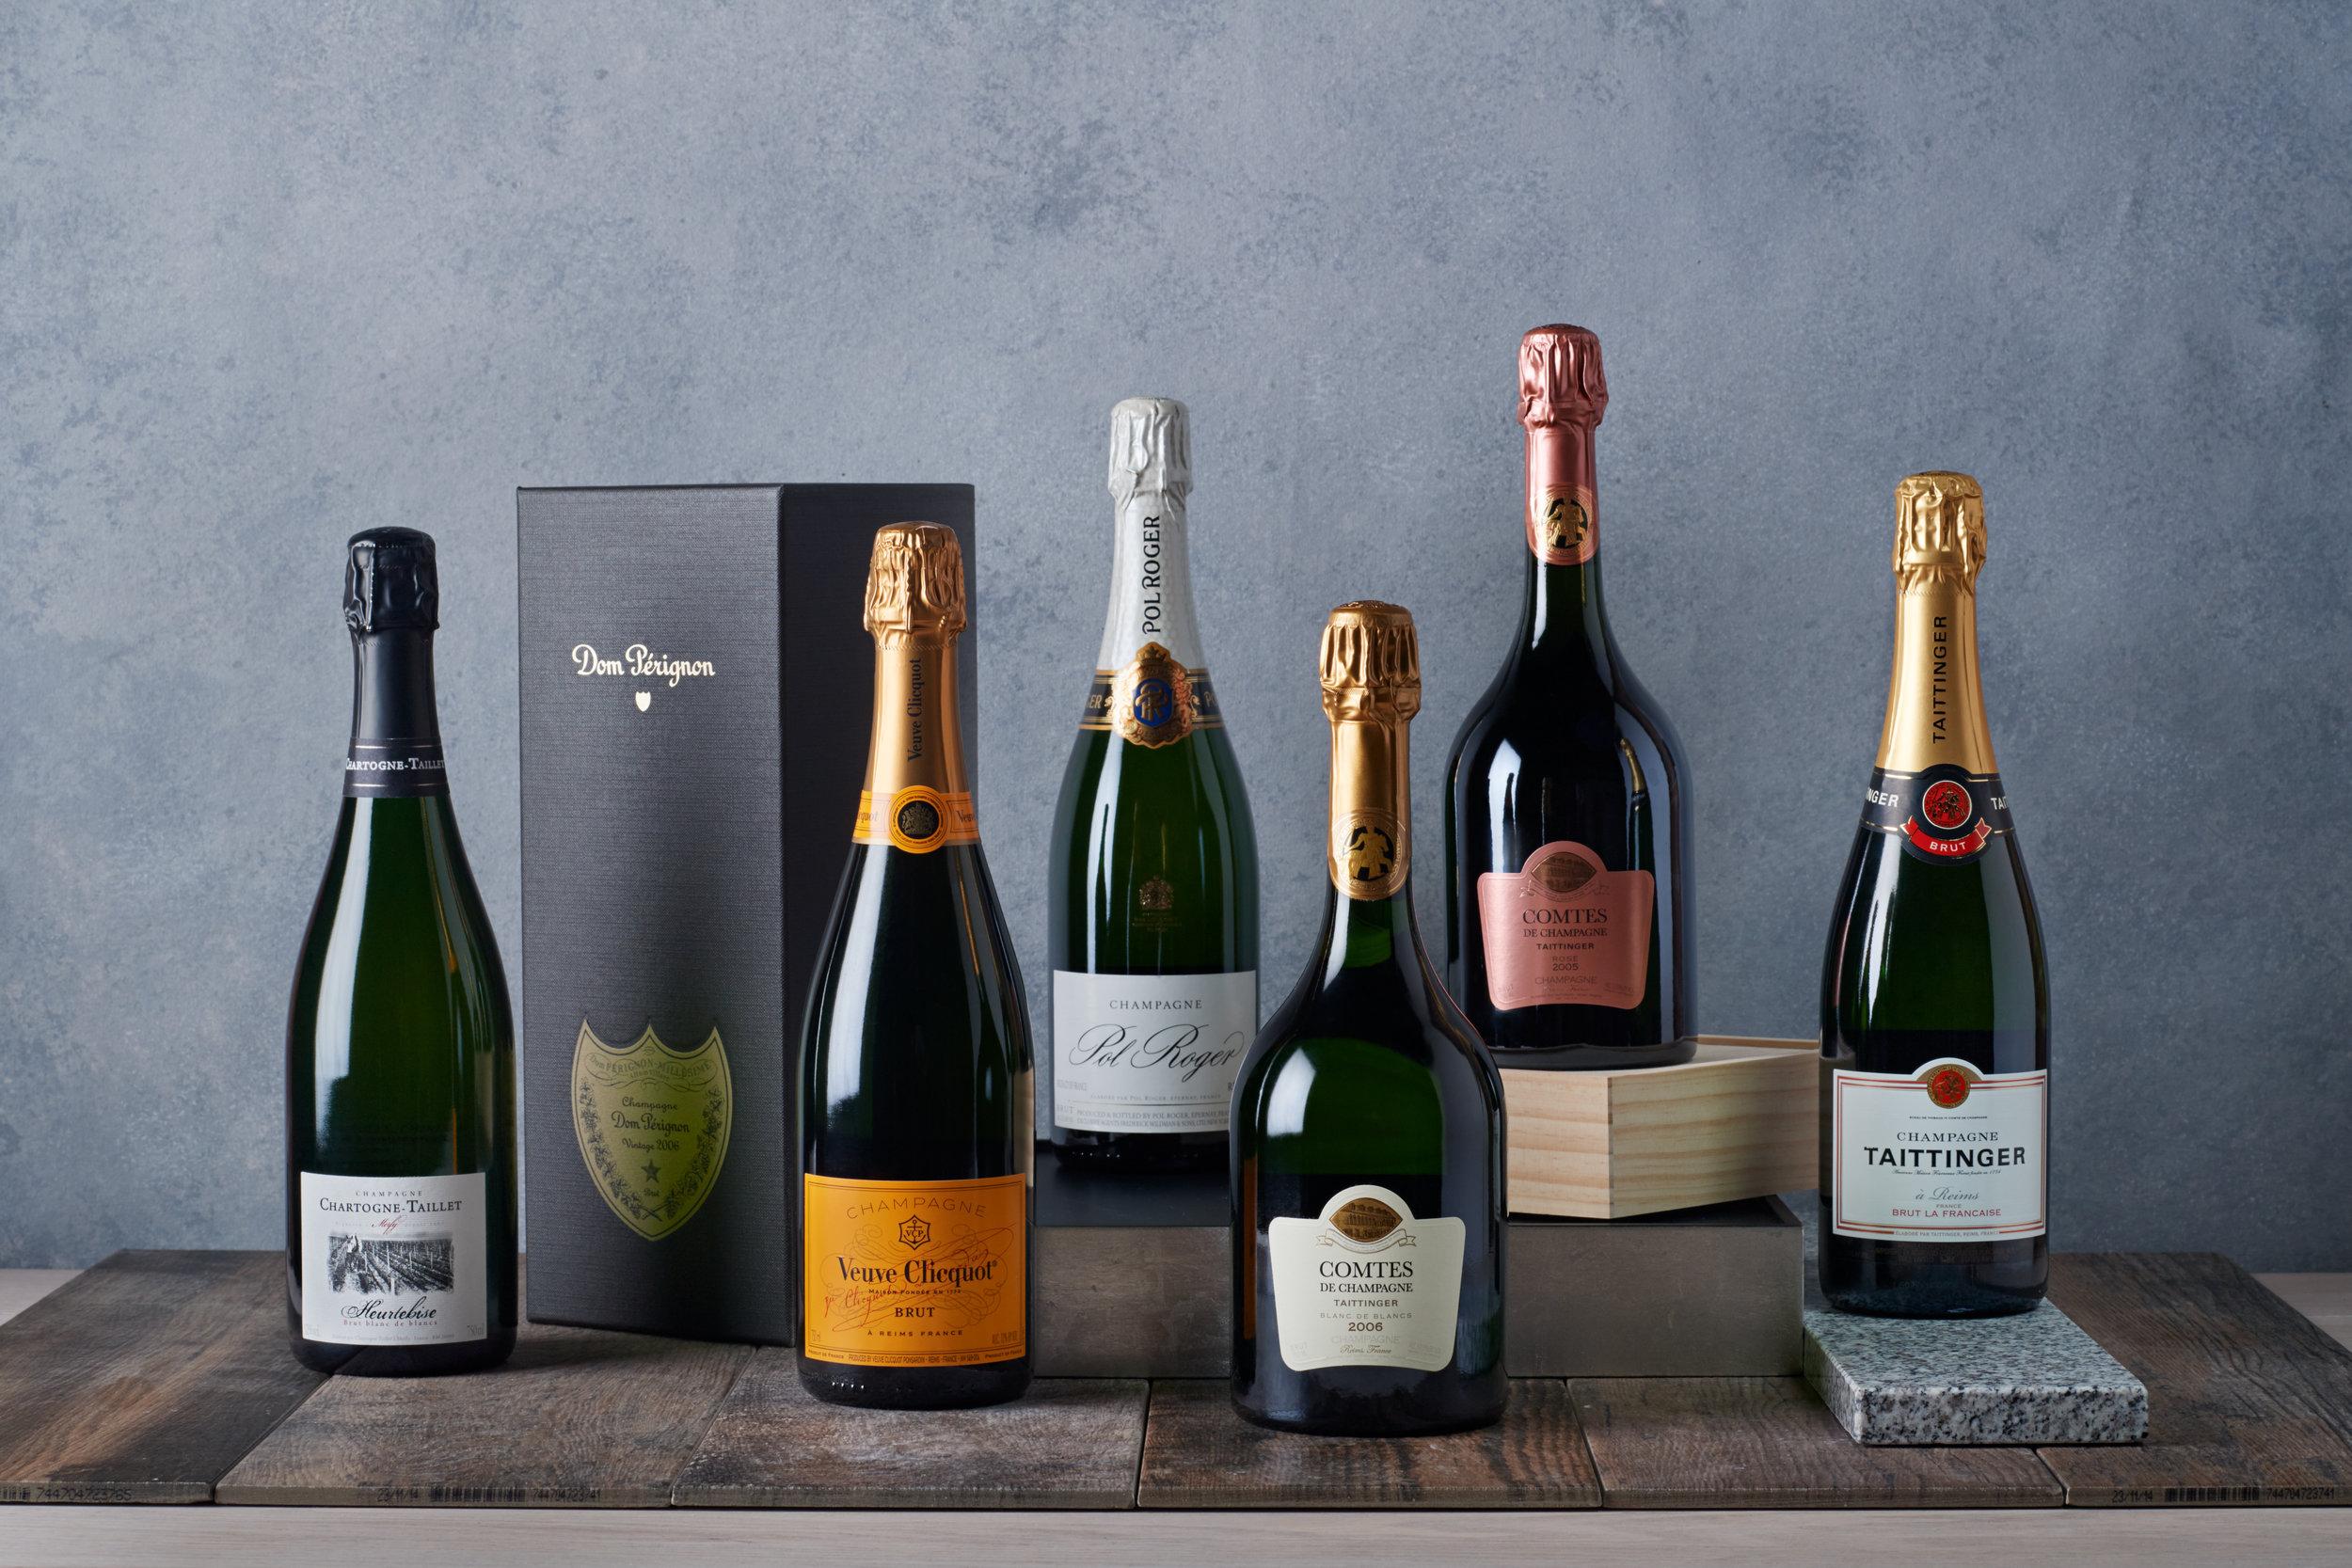 06_champagne.jpg